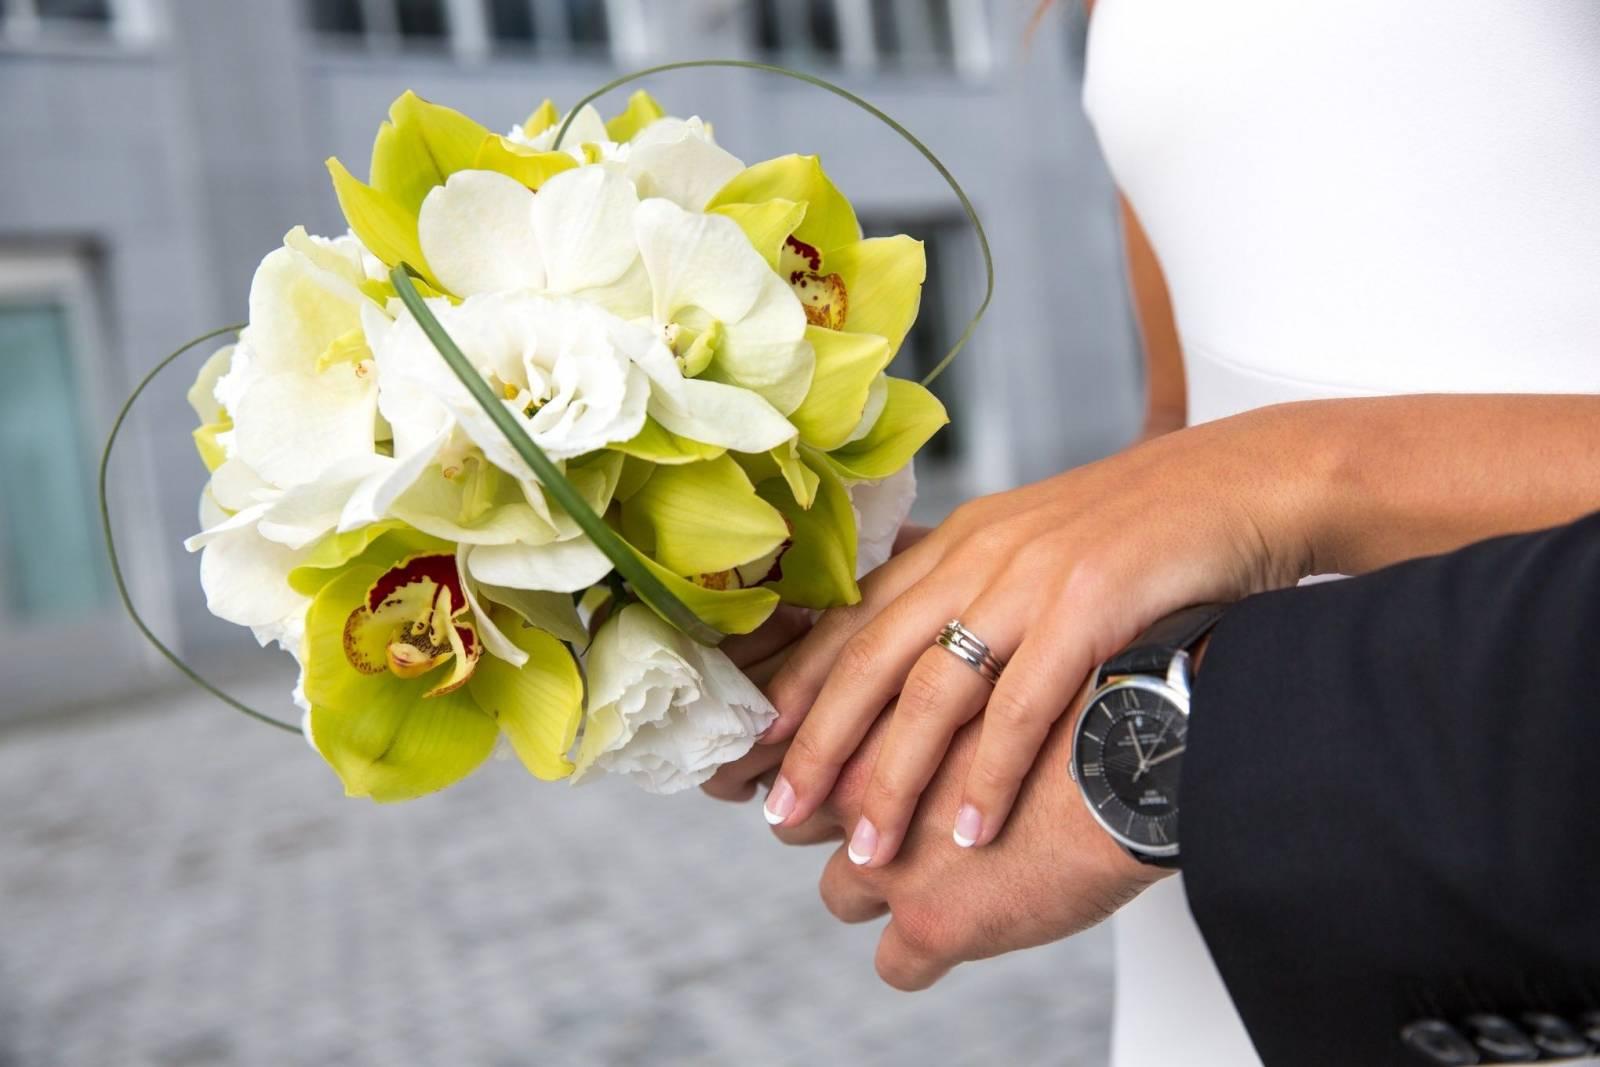 The London Ceremony Masters - Ceremoniemeester - House of Weddings - 1